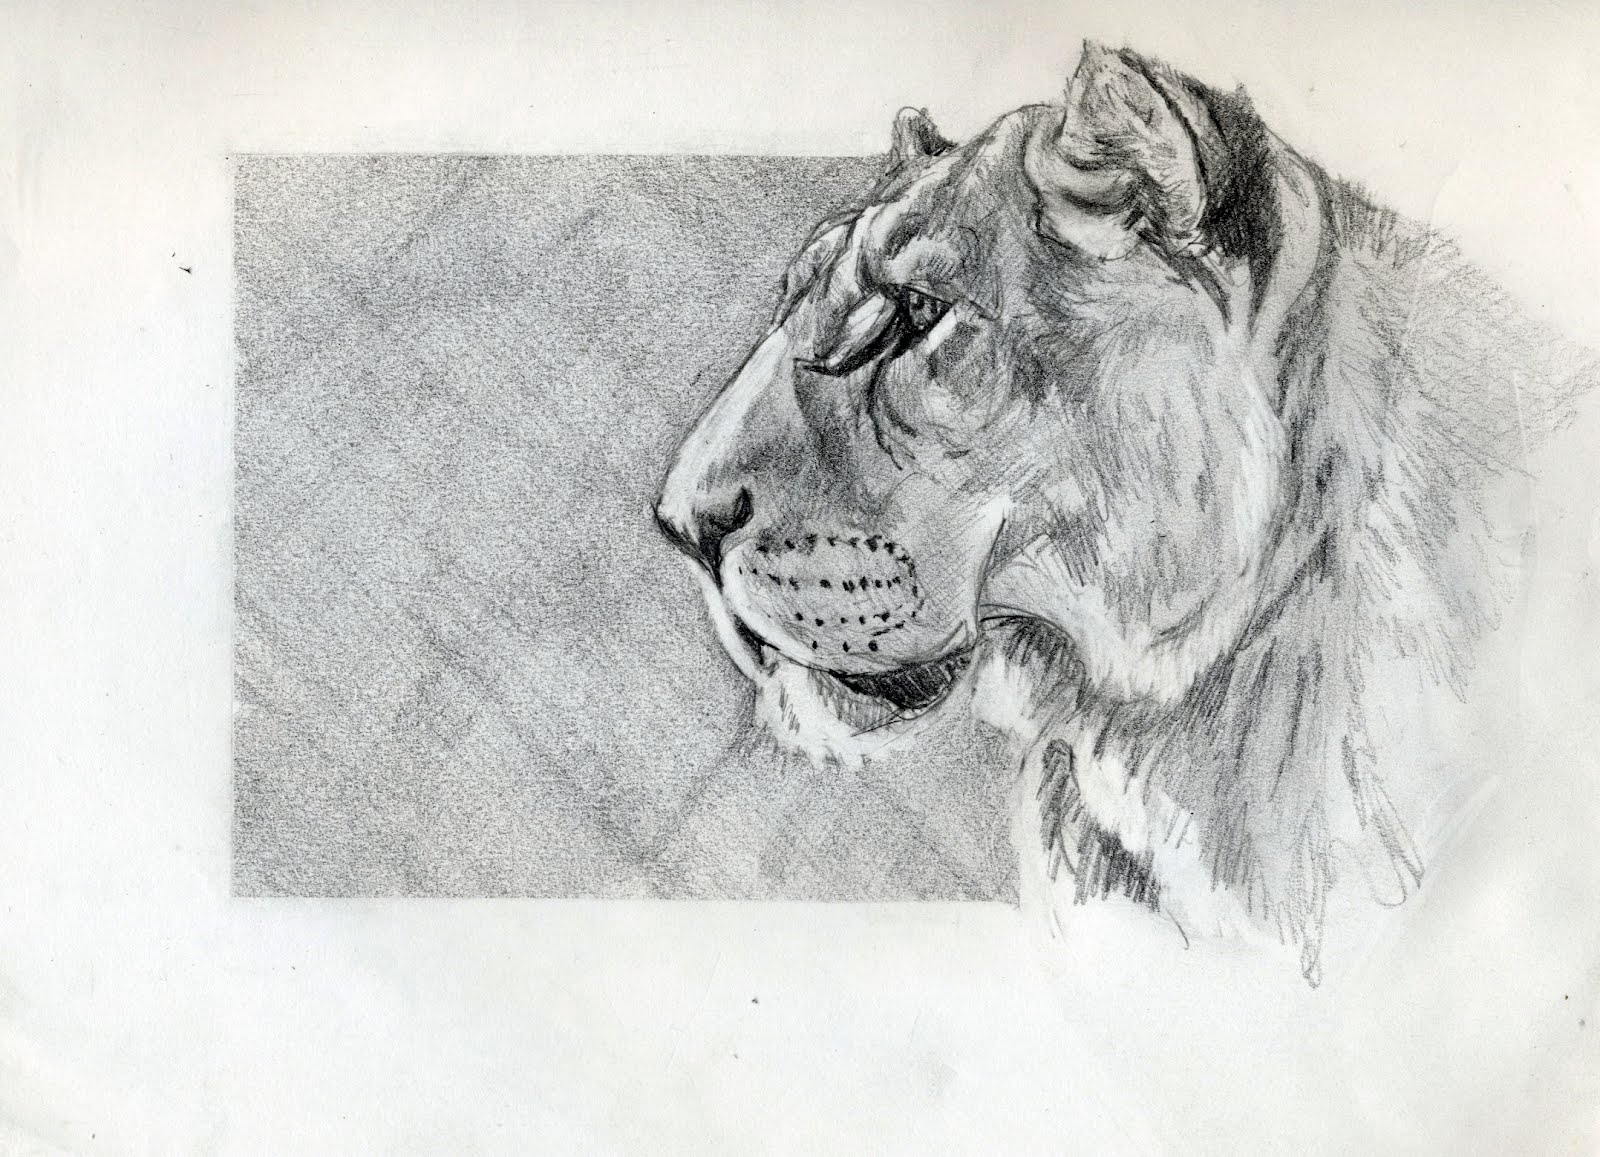 Cat-in-a-Box: Quick Lion Sketch